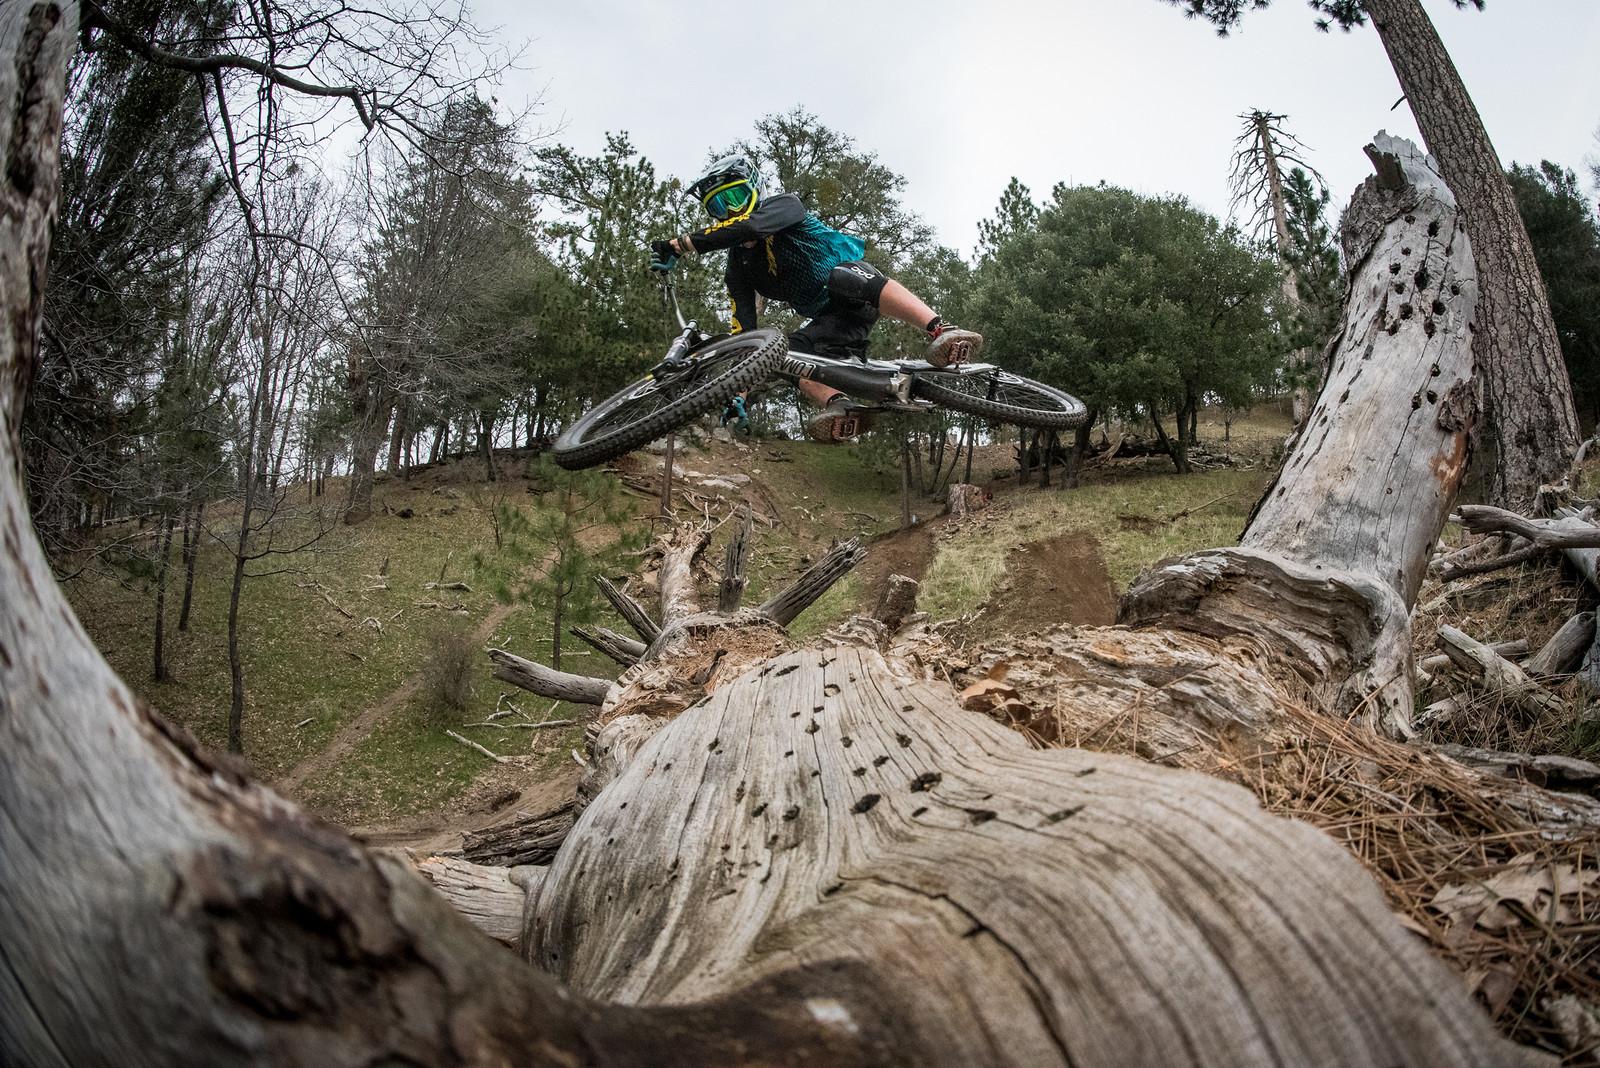 Luca Jumping a Tree - FredLikesTrikes - Mountain Biking Pictures - Vital MTB